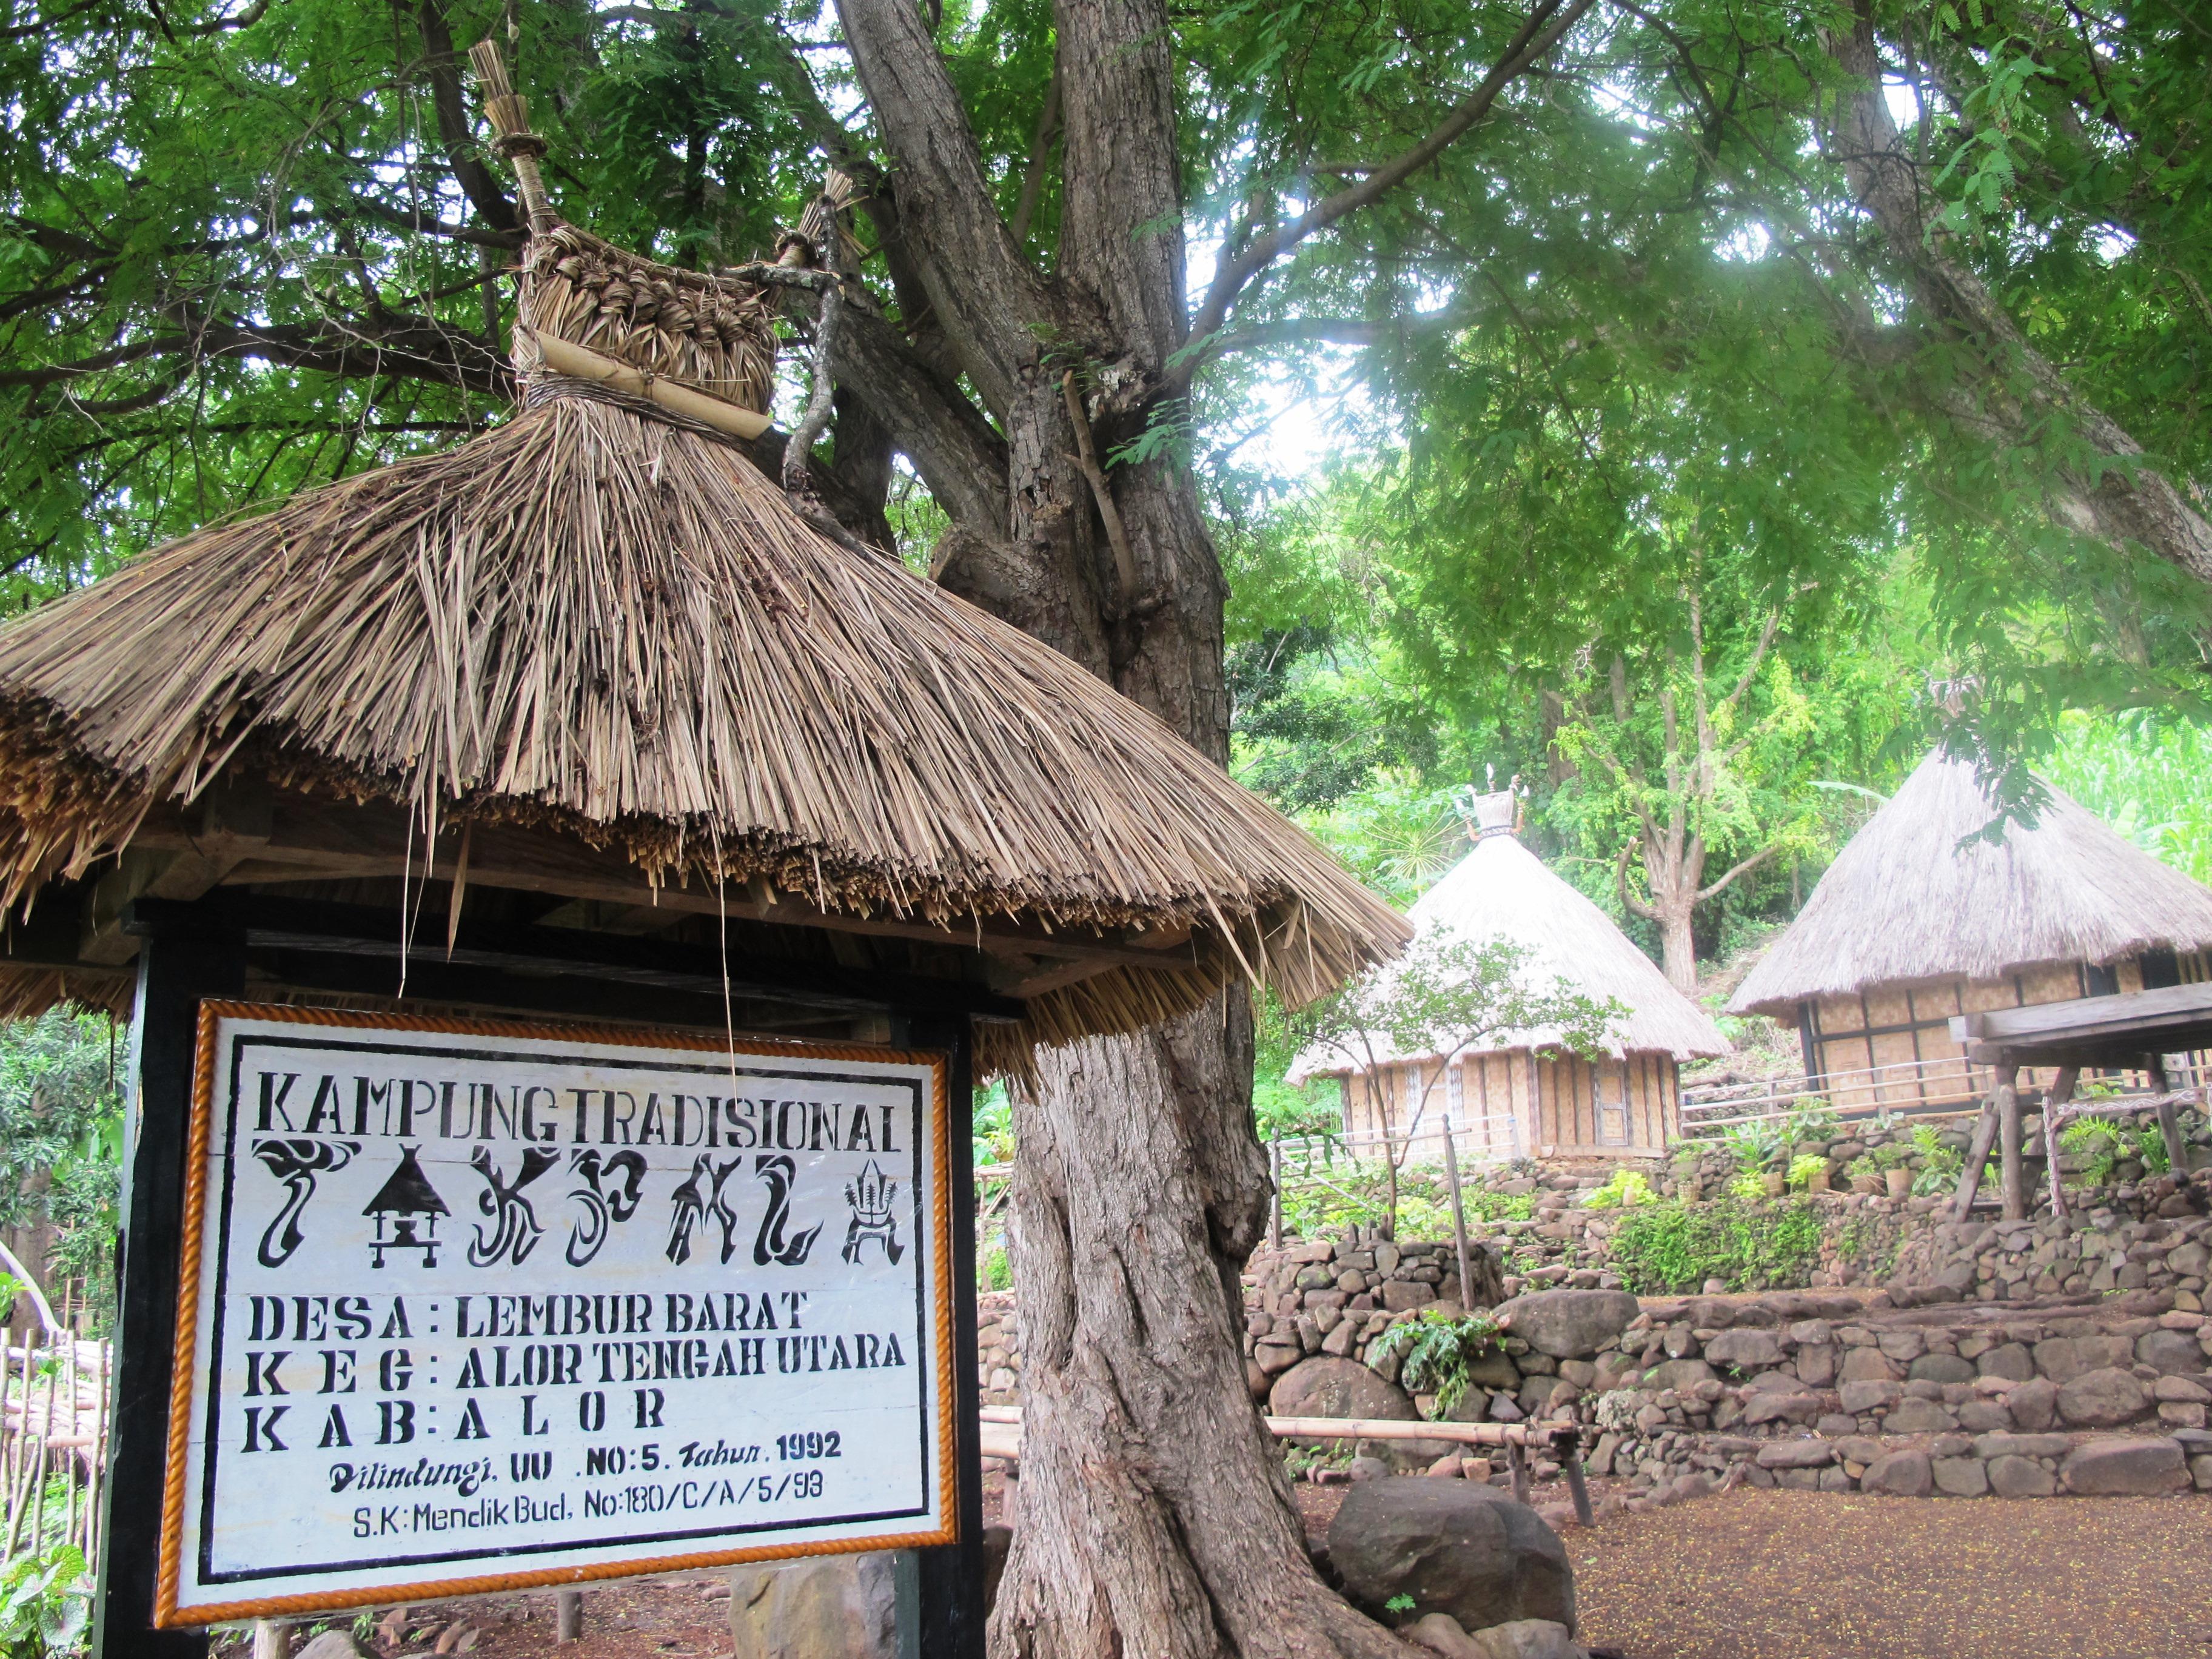 Pintu kampung Takpala | Foto: Bentang Alam Semesta